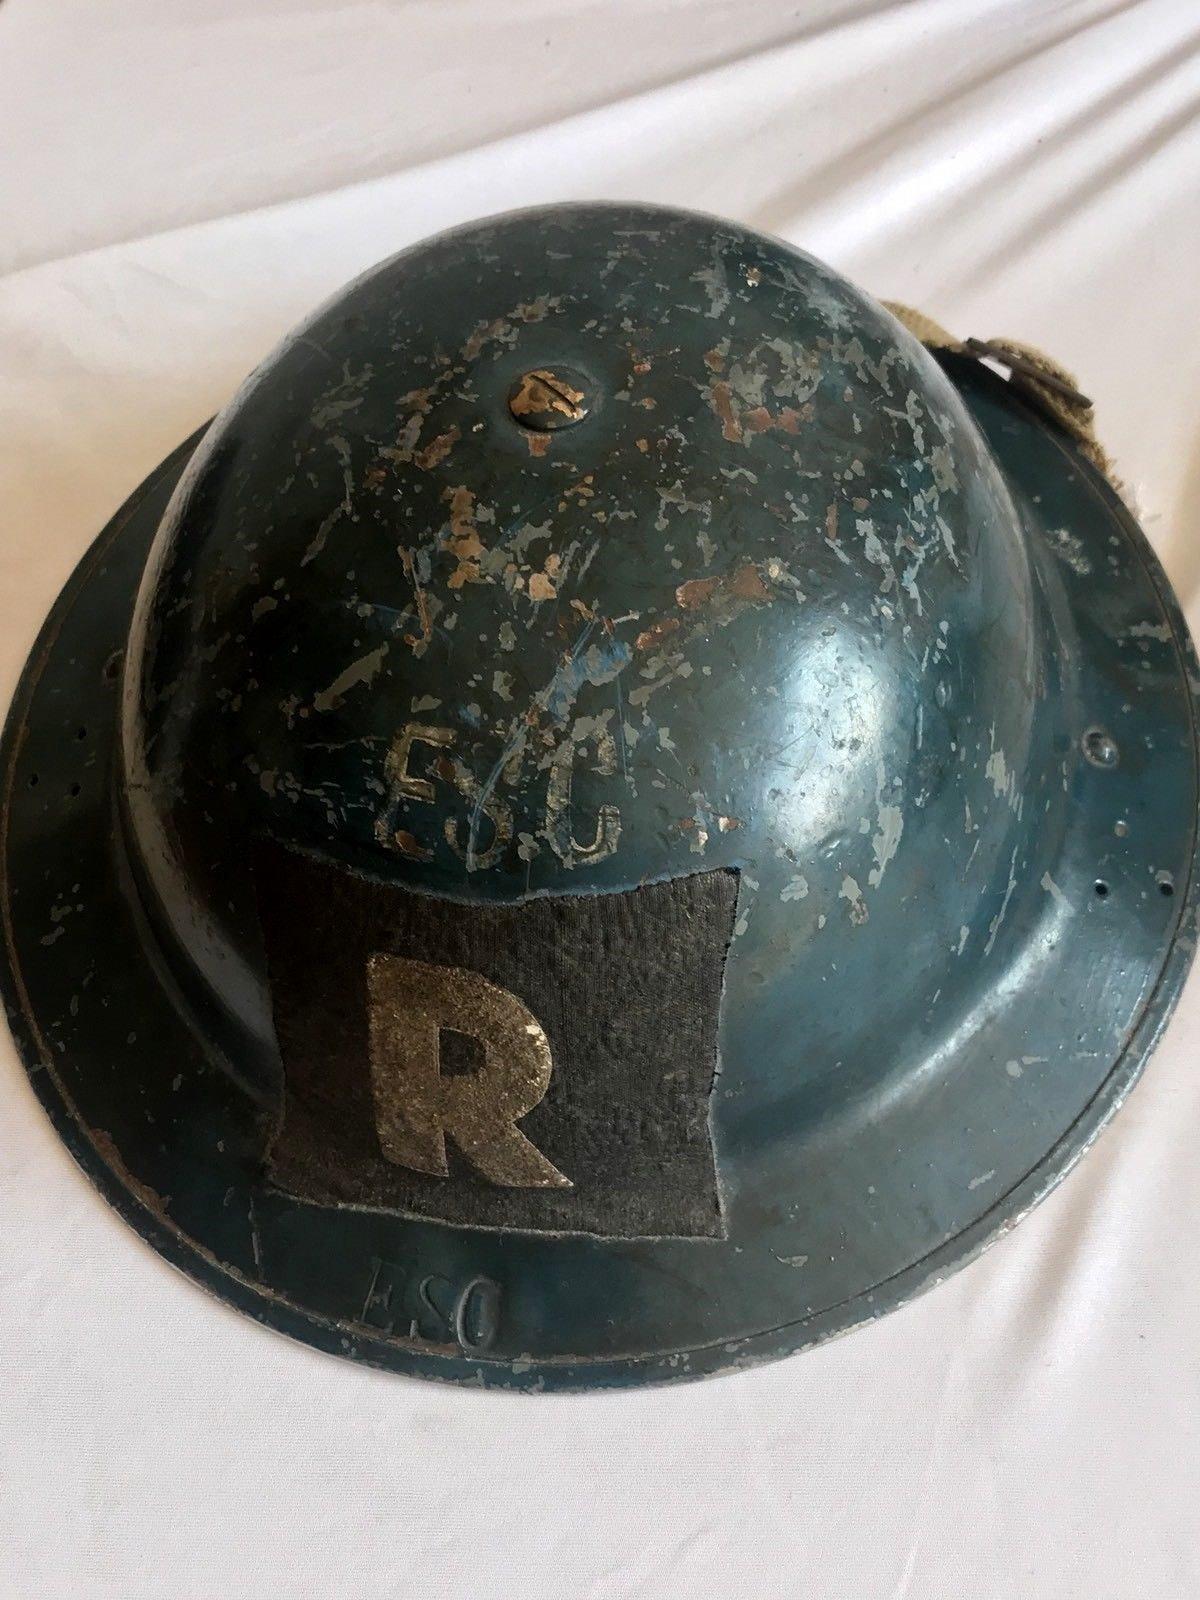 British WW1/WW2 Brodie Helmet Maker Stamps - Page 4 - Helmets and